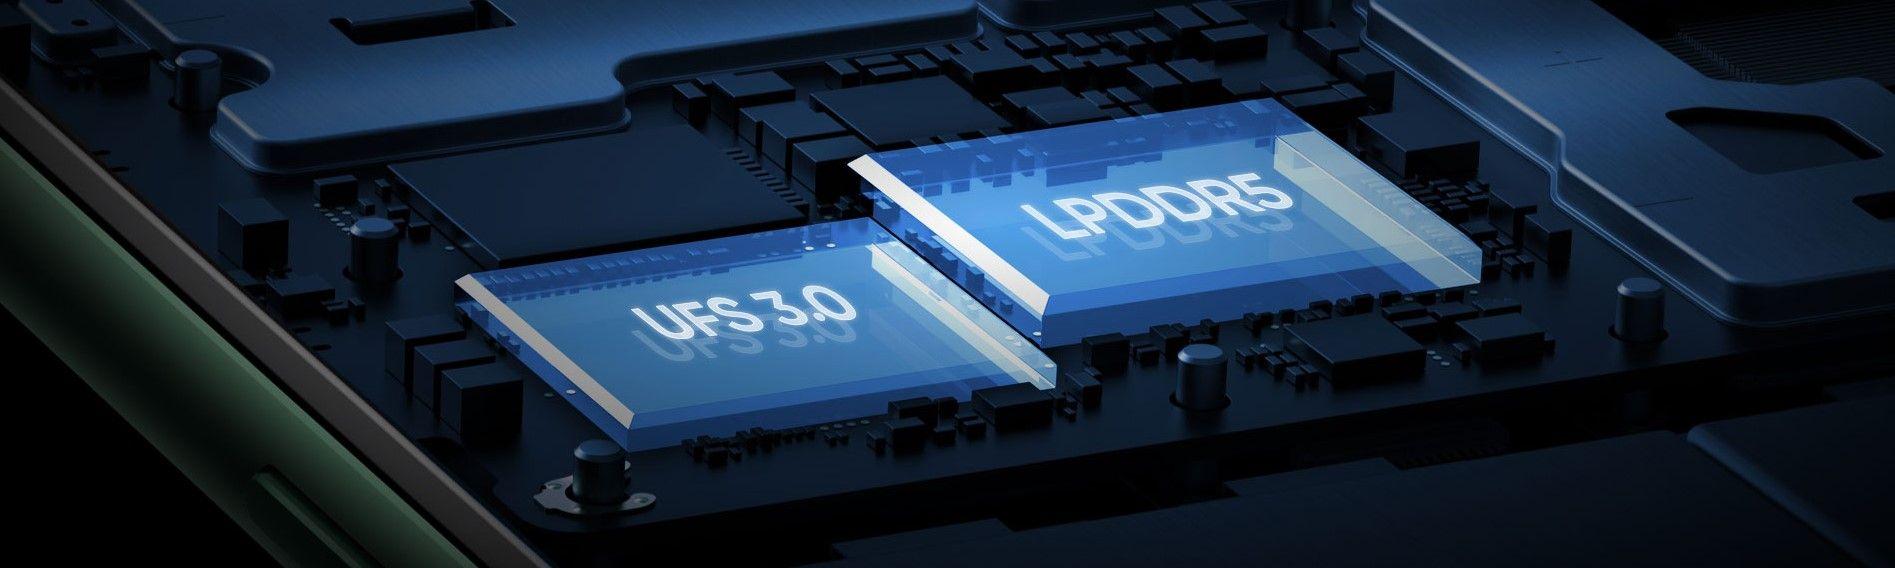 Realme X50 Pro оперативная память